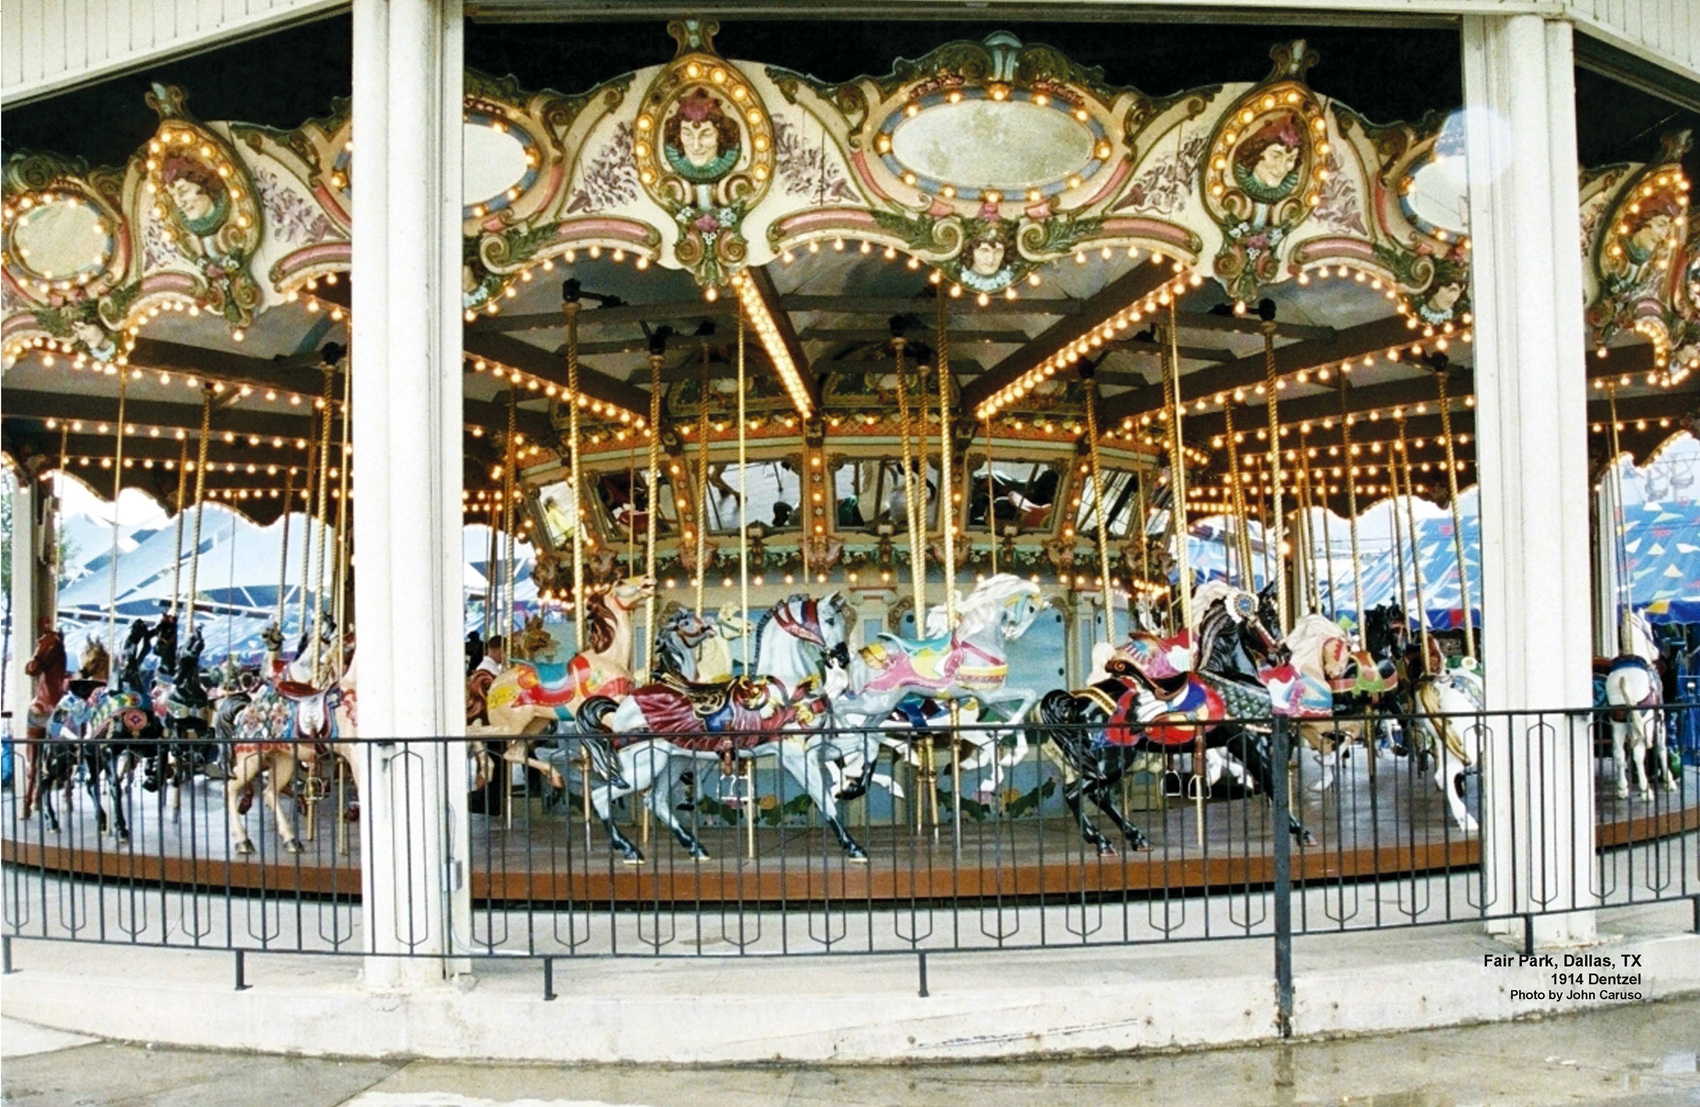 Historic-Dallas-Fair-Park-Dentzel-carousel-CNT-center-Oct-07